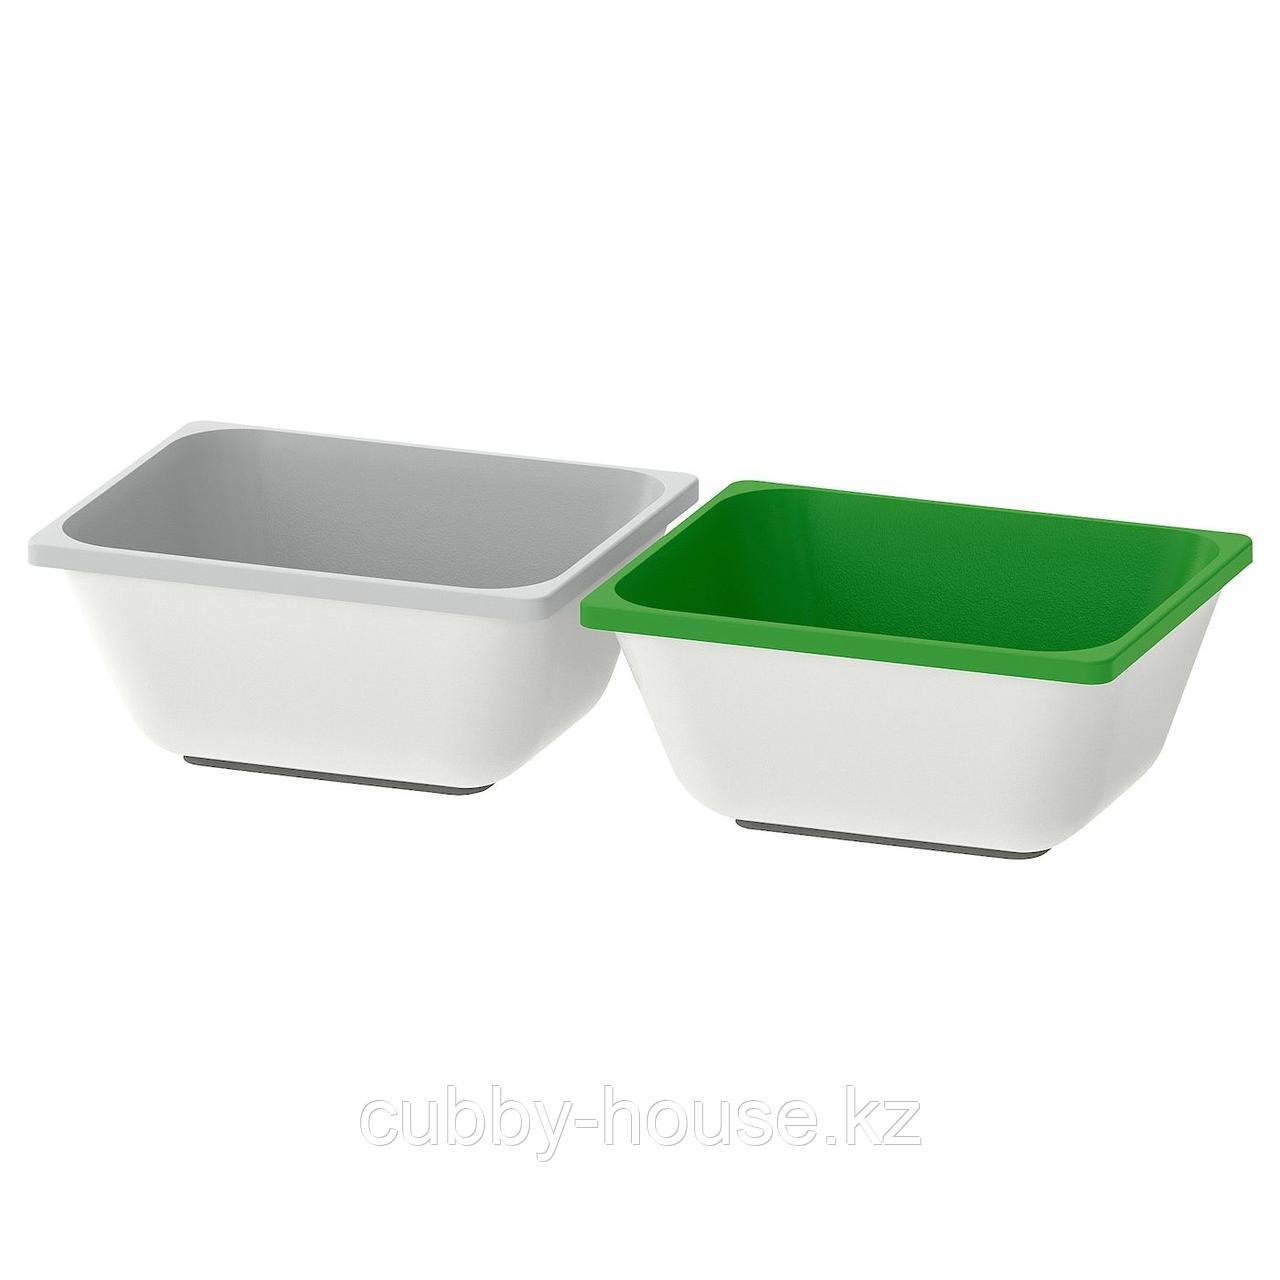 ВАРЬЕРА Контейнер, зеленый, серый, 10x12 см